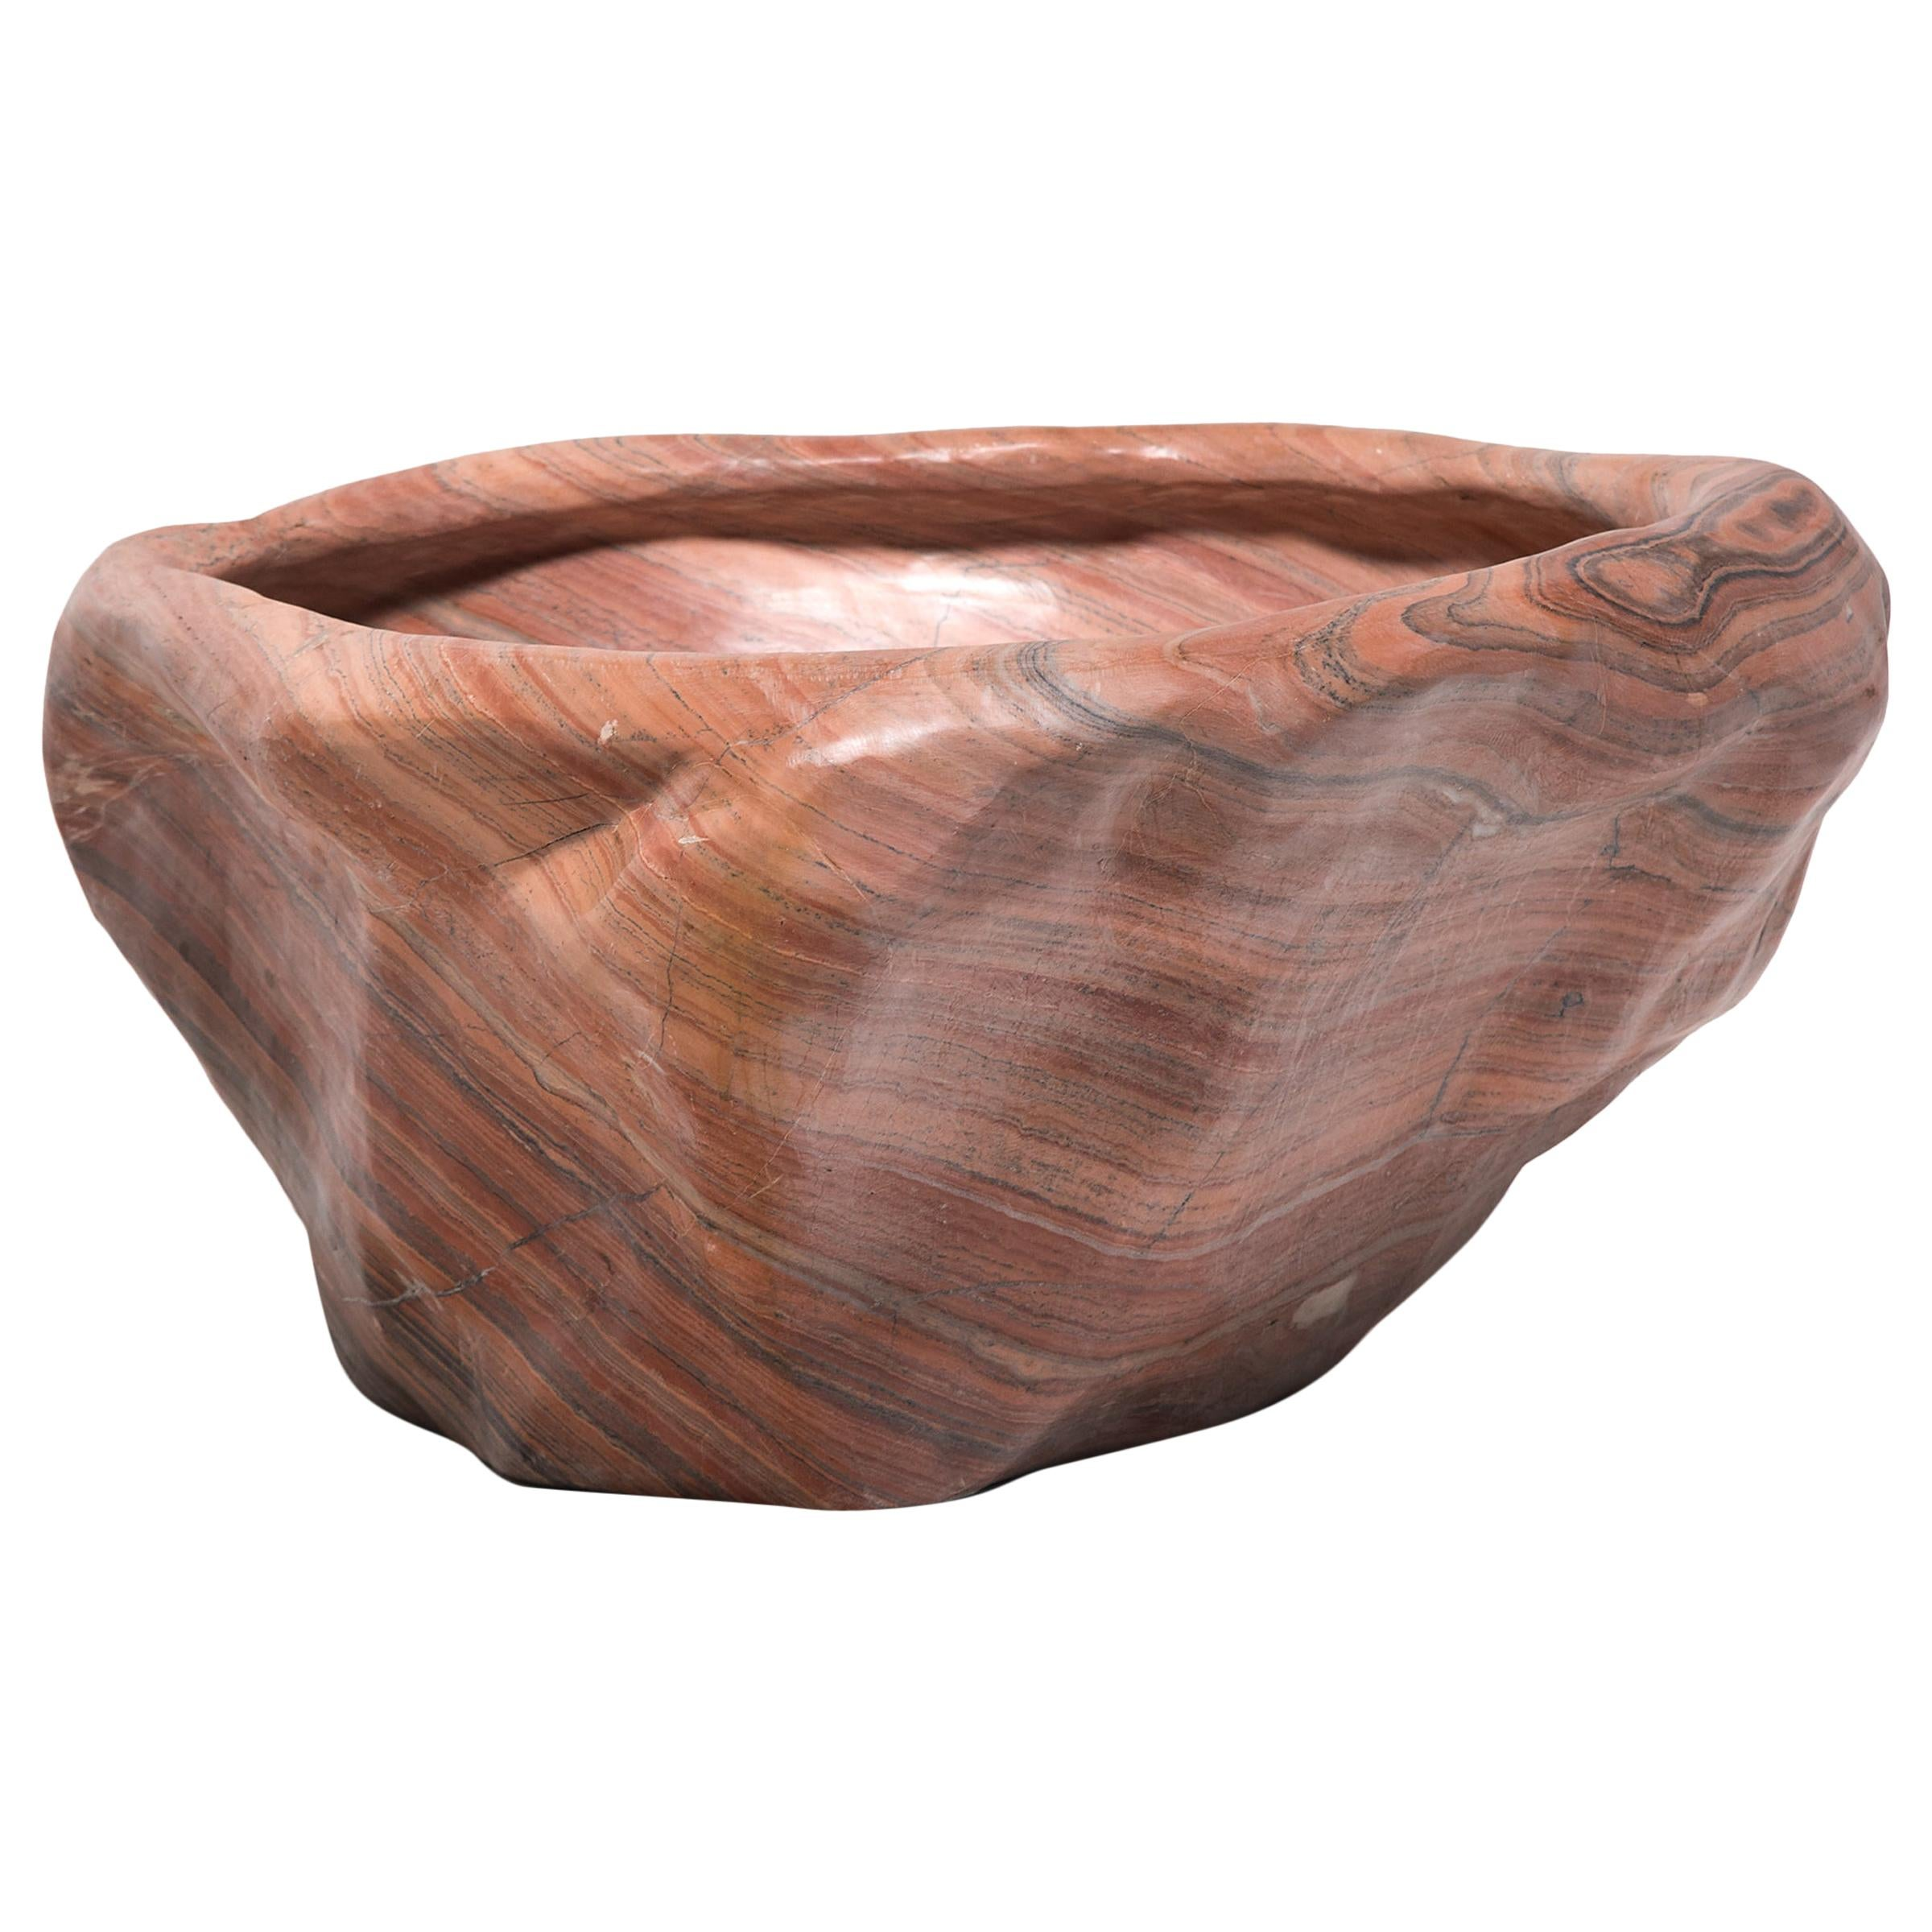 Nan Yang Stone Basin